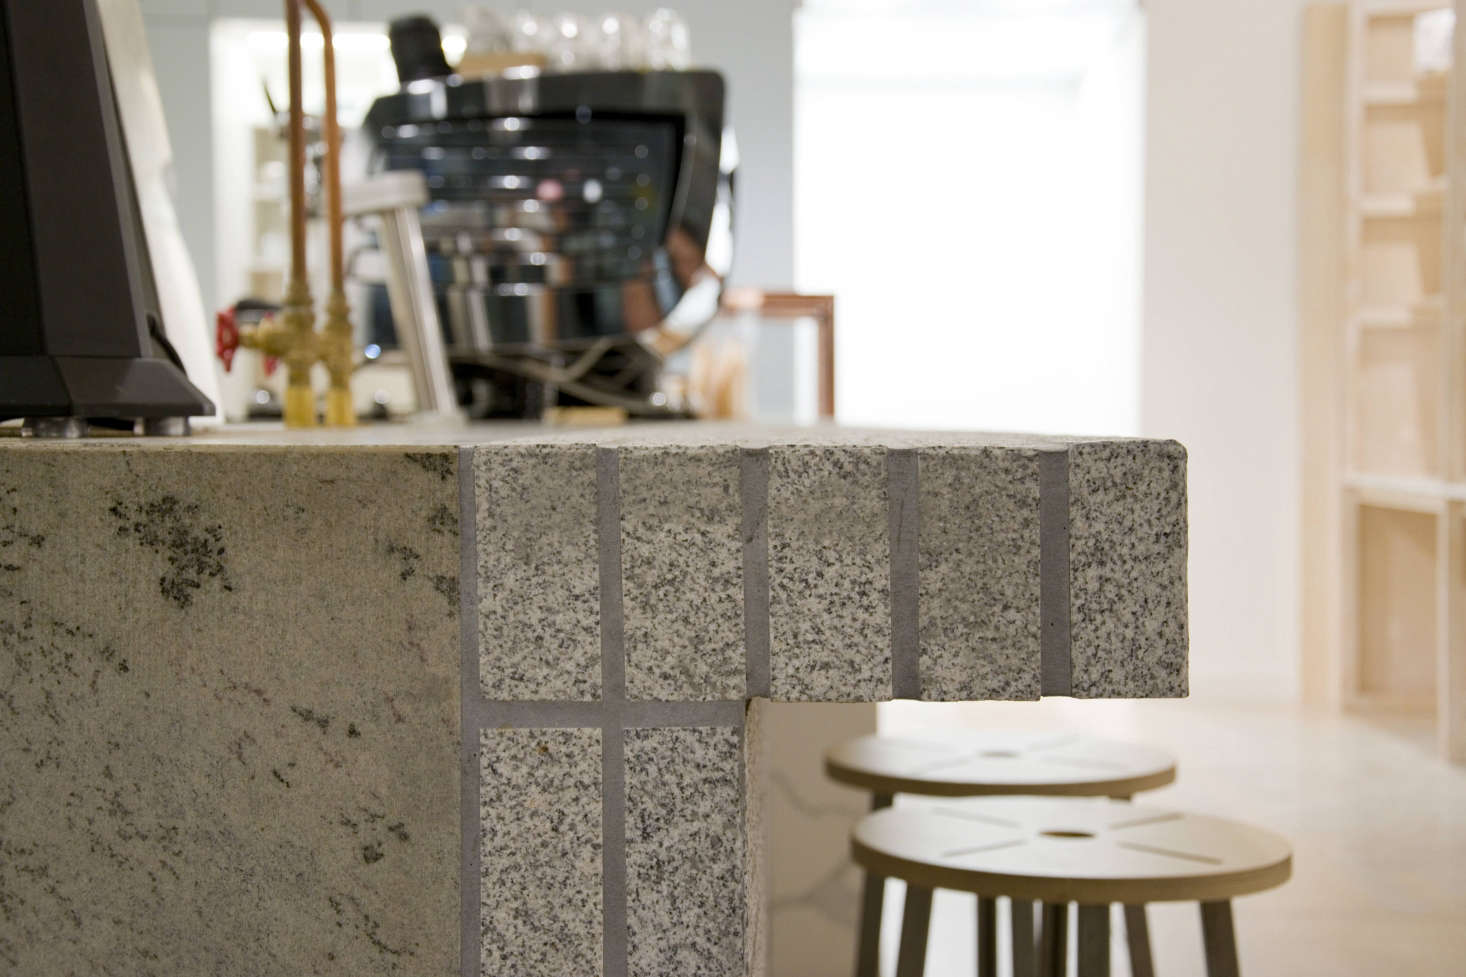 Mossy eucalyptus granite alongside granite bricks.